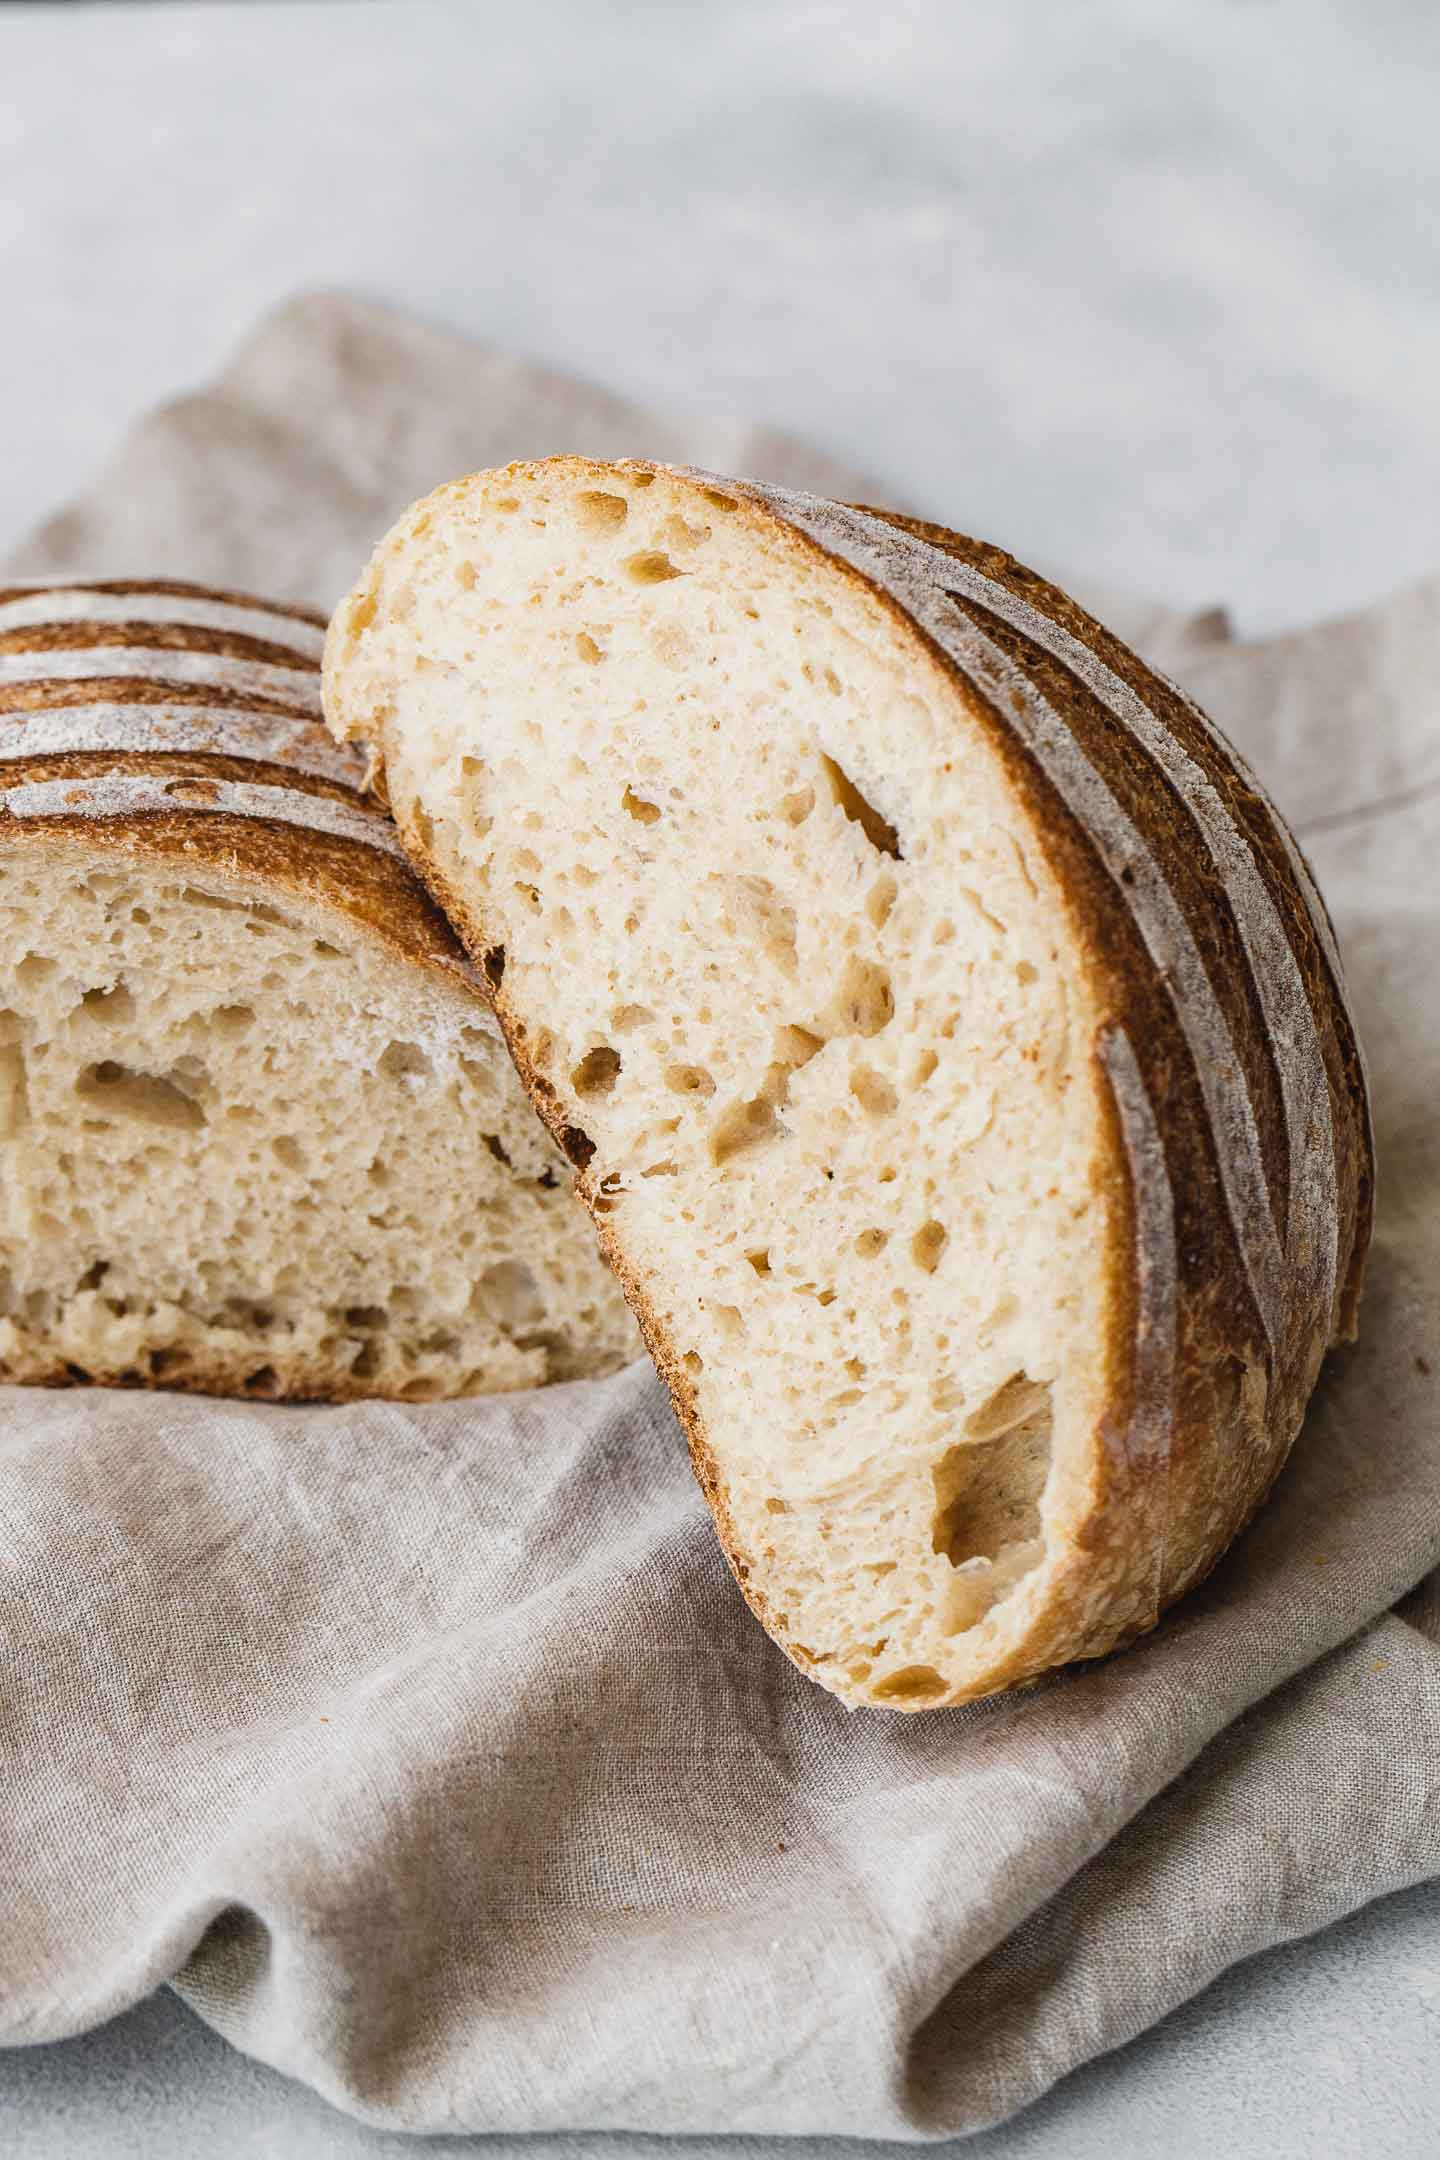 A loaf of sourdough bread cut in half.